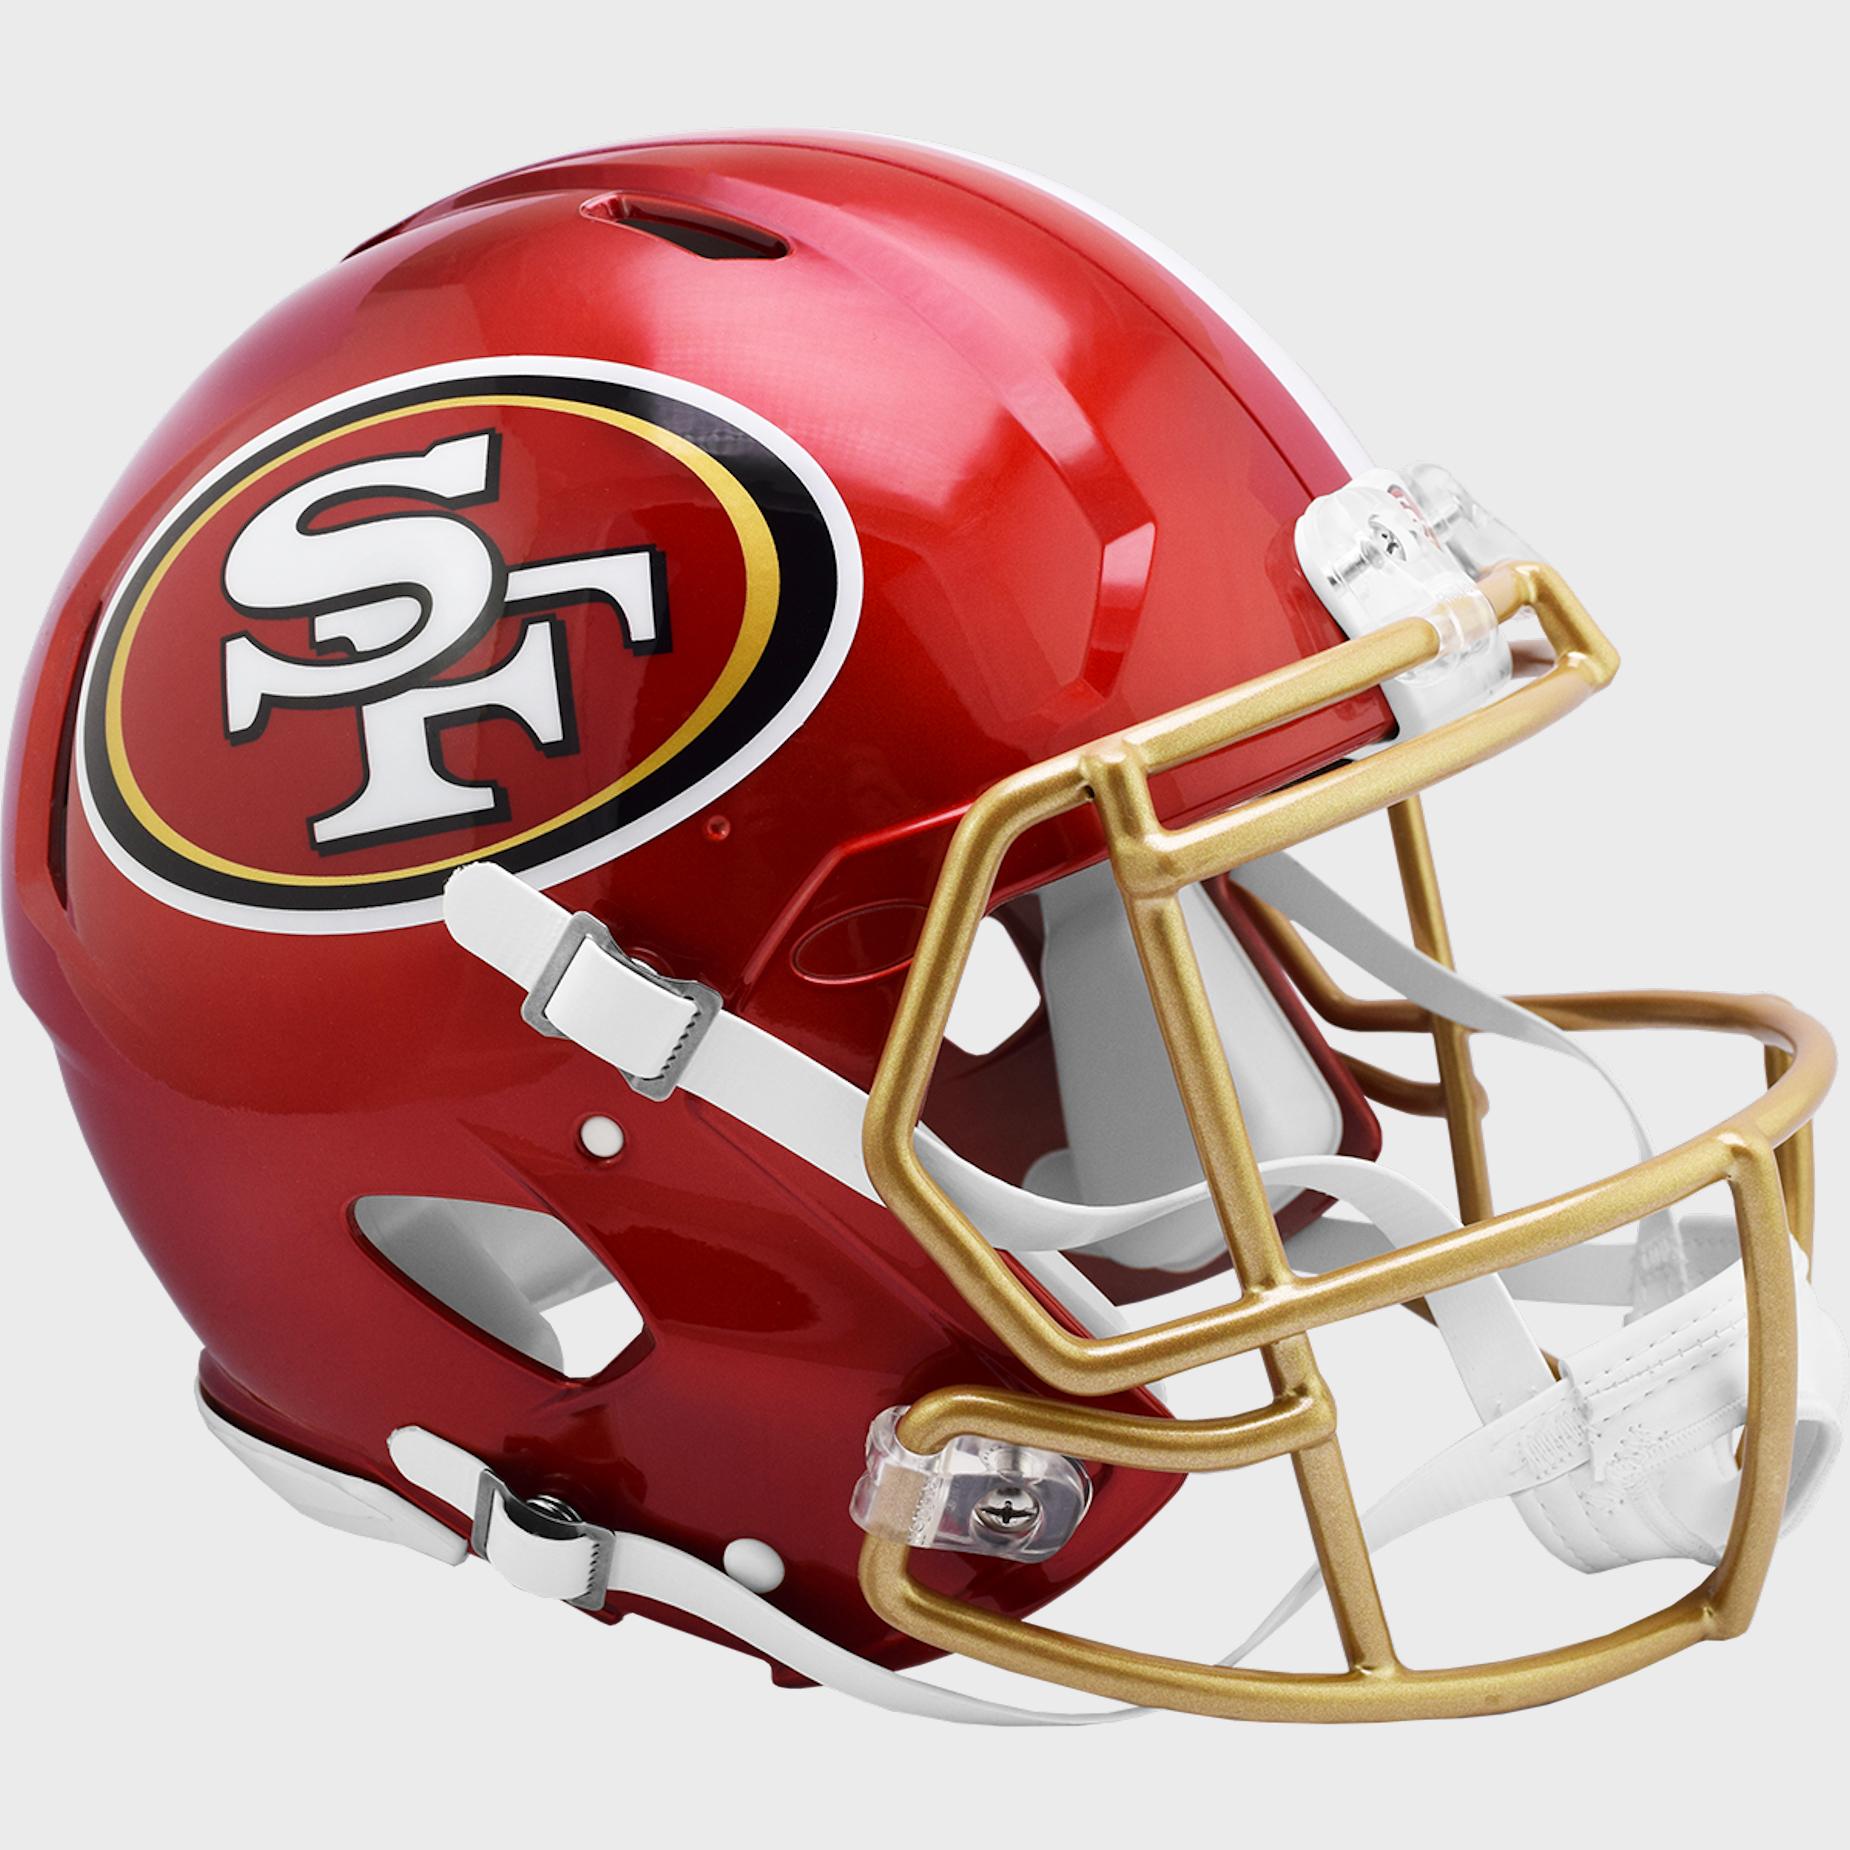 San Francisco 49ers Speed Football Helmet <B>FLASH ESD 8/21/21</B>